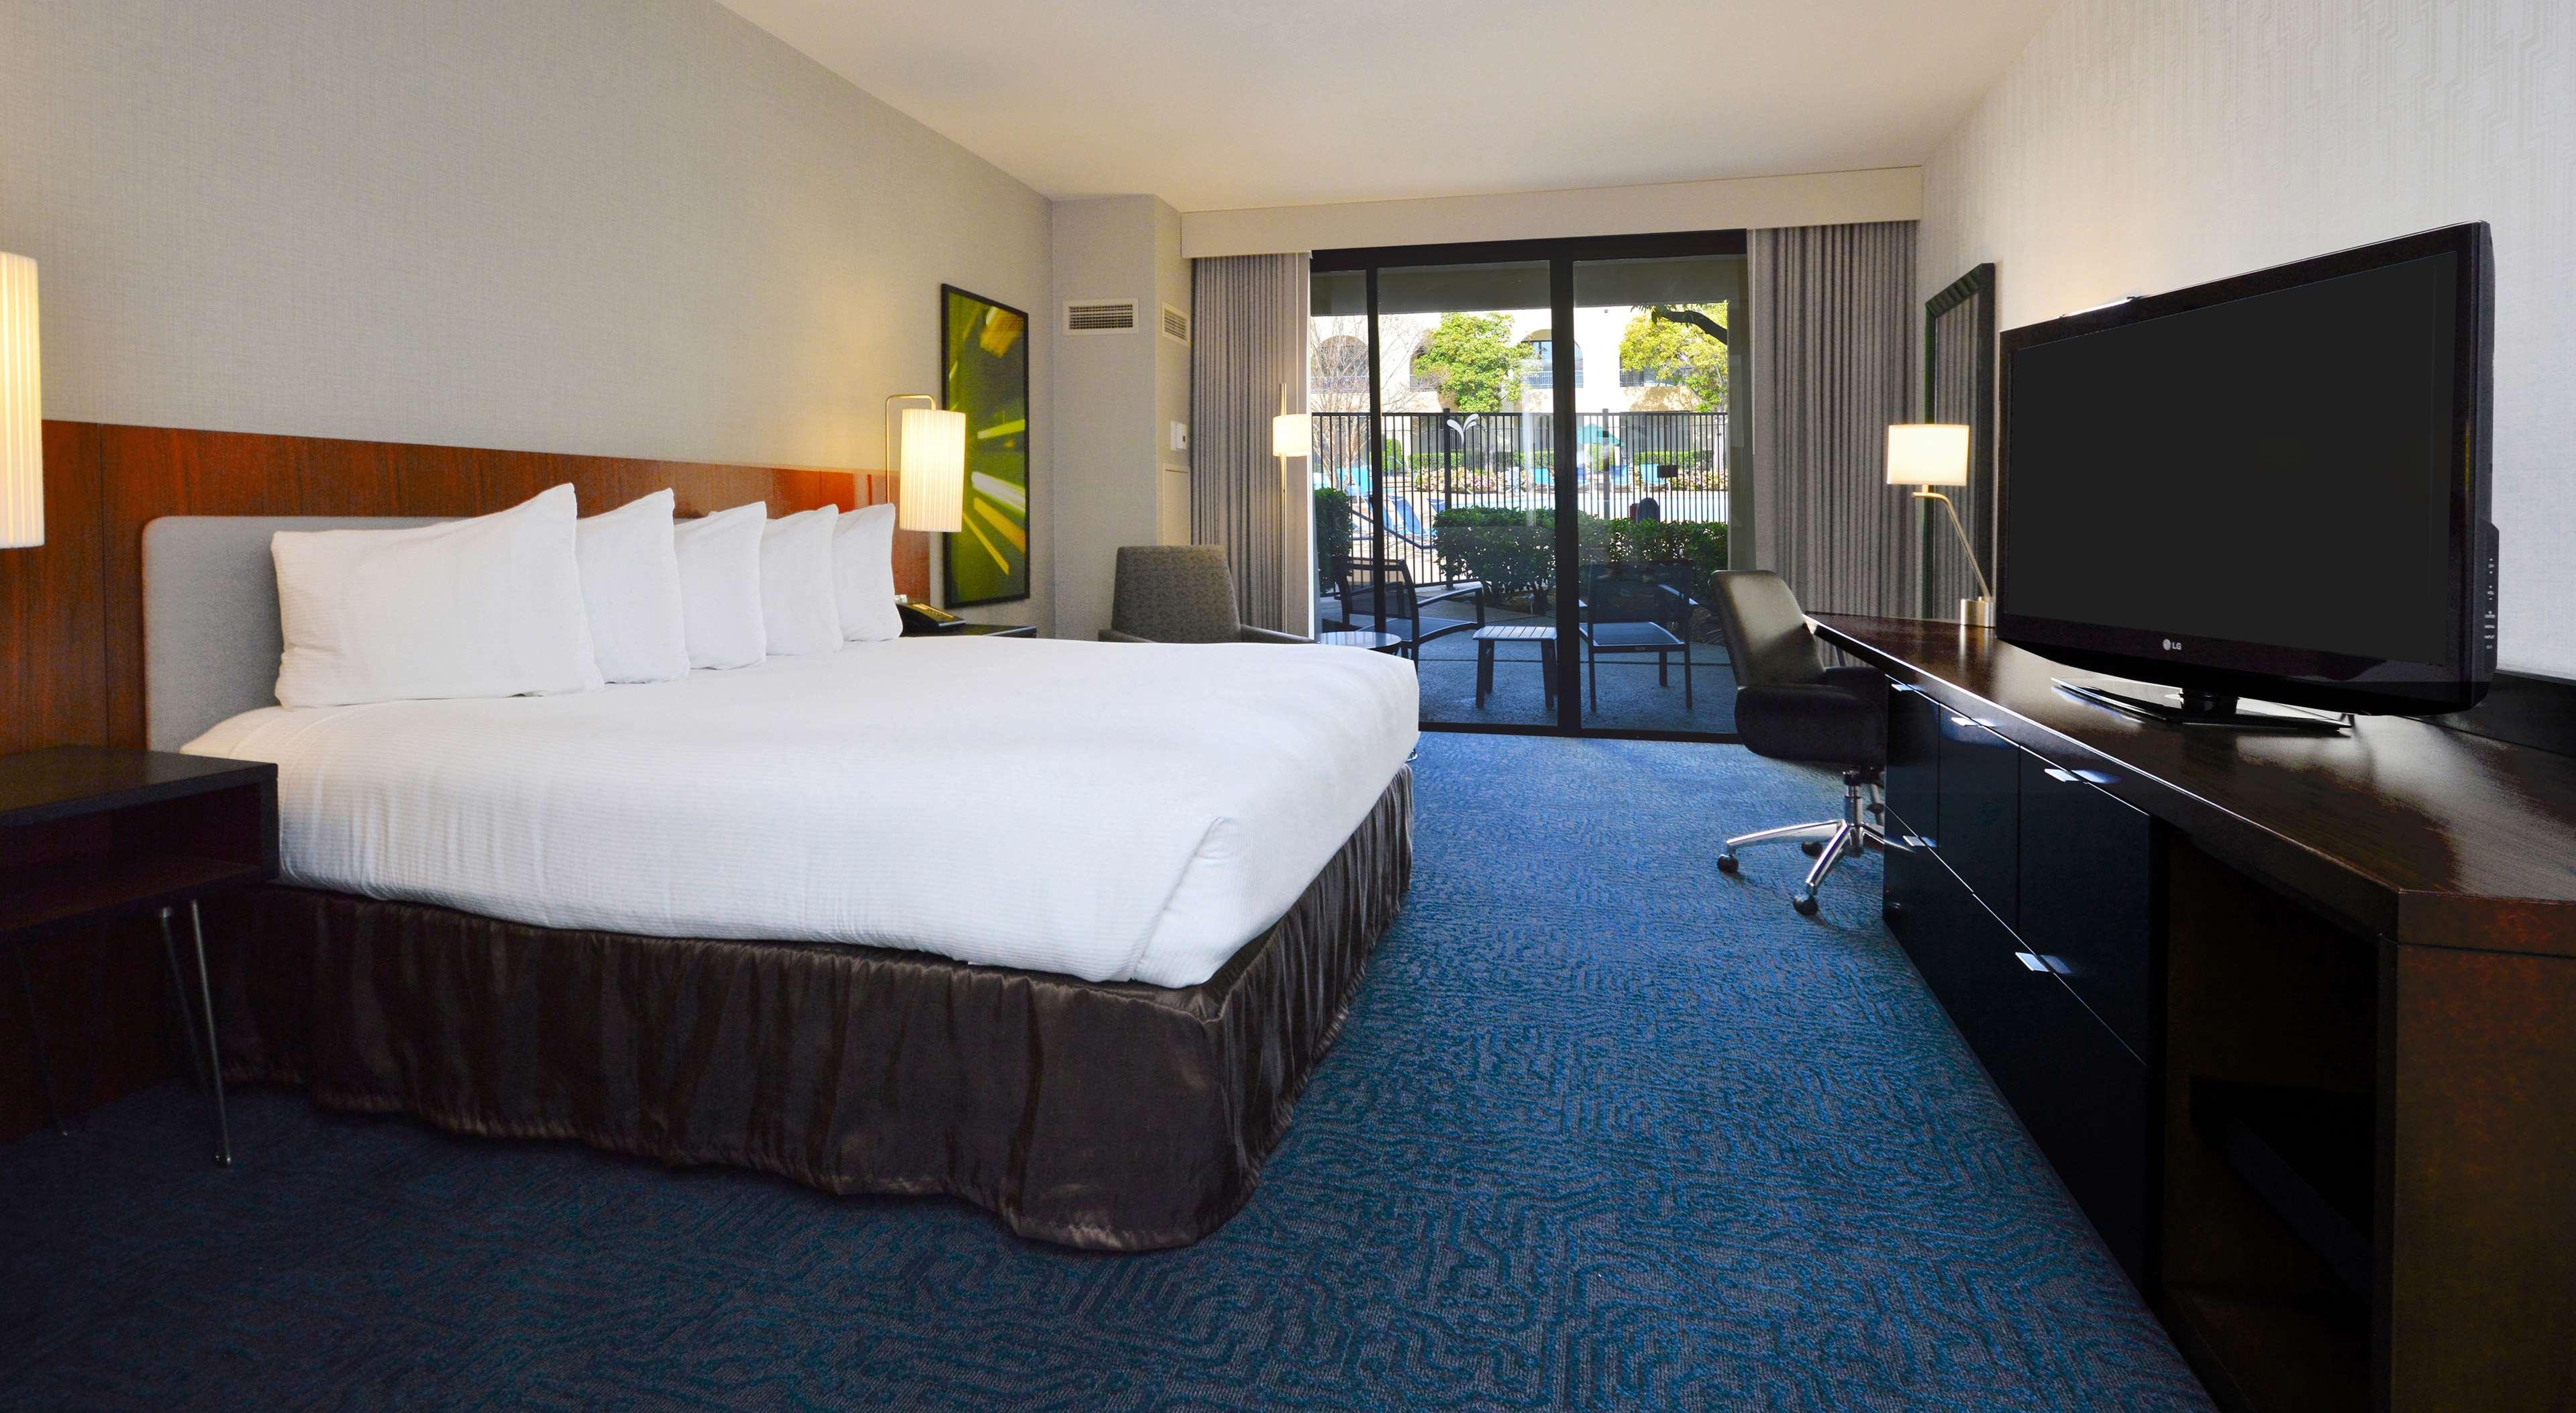 DoubleTree by Hilton Hotel Newark - Fremont image 28